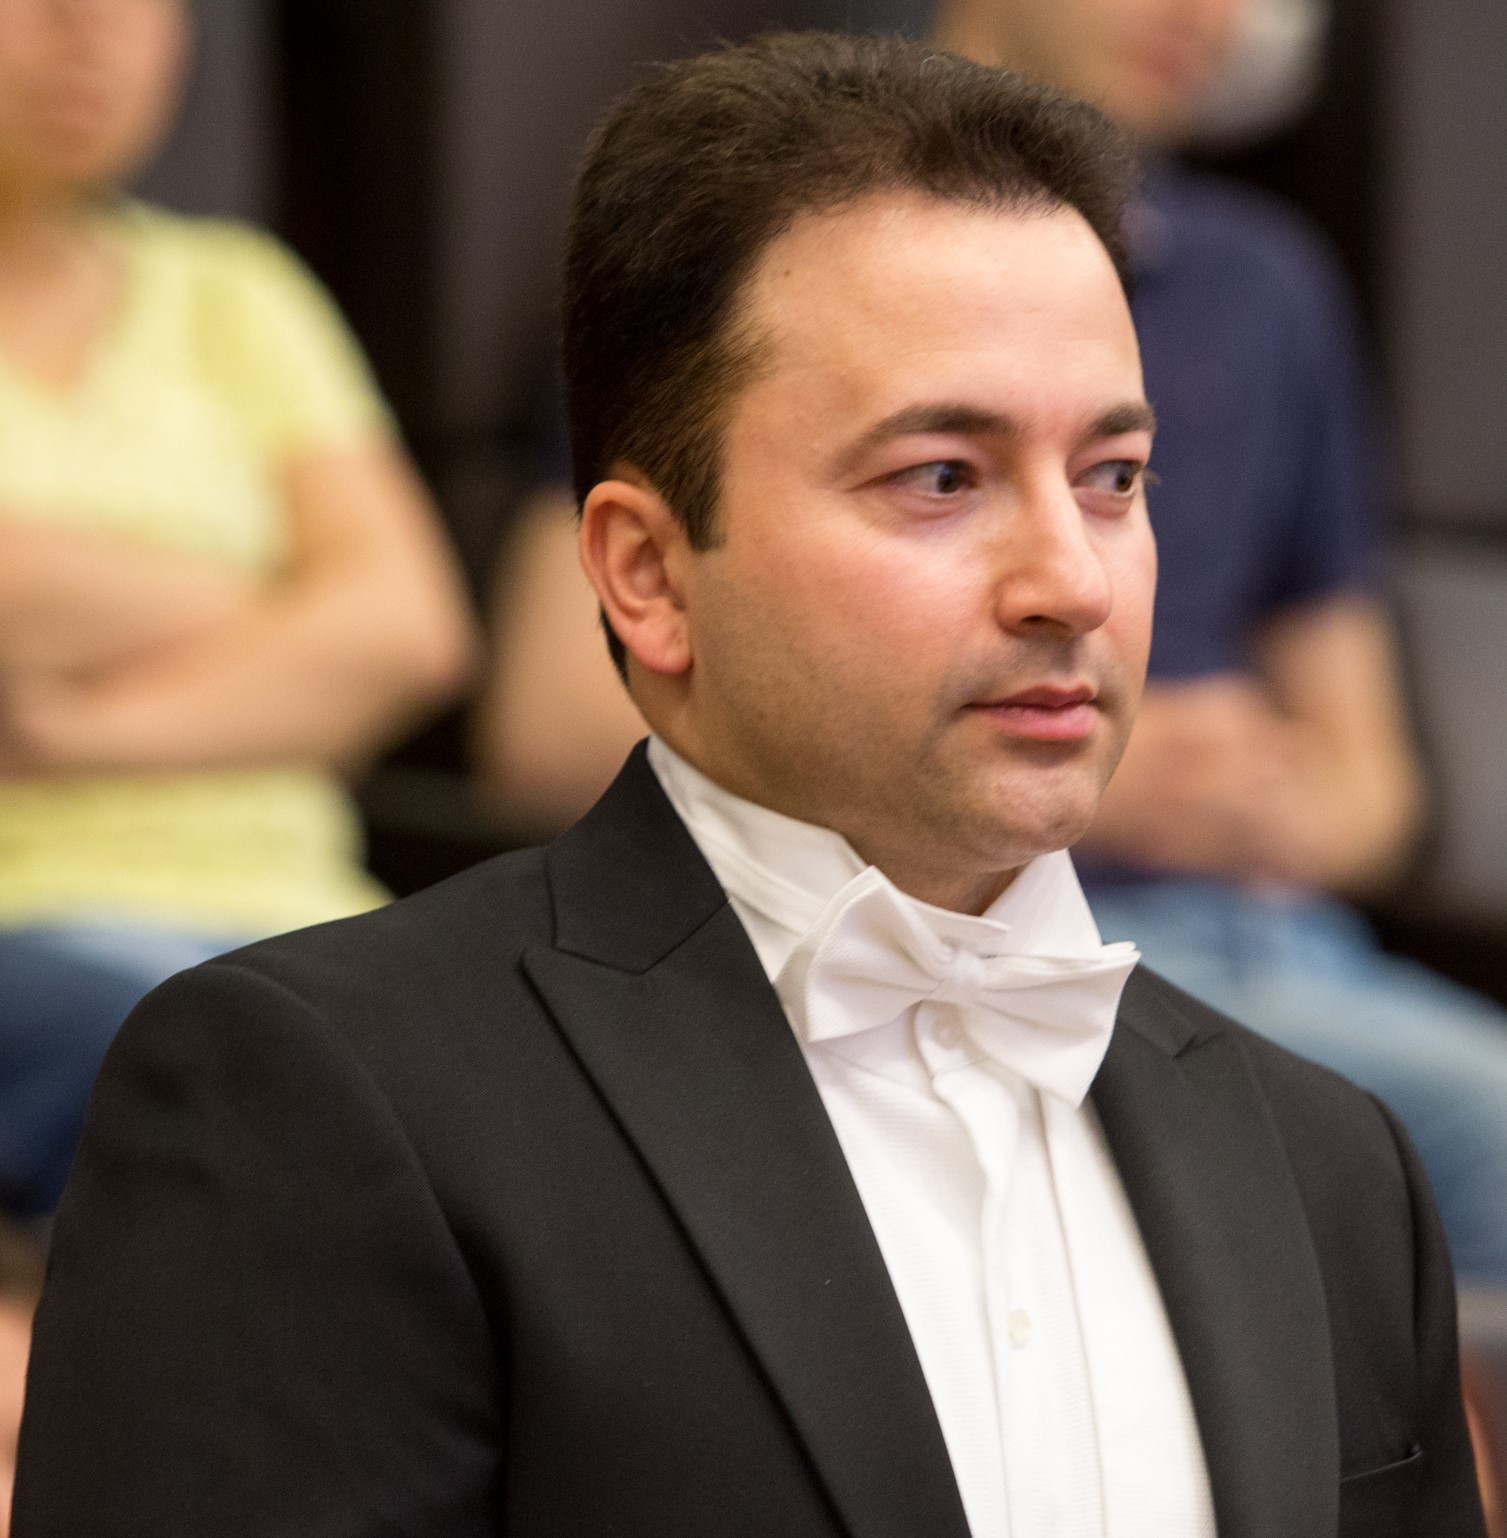 Ehsan Shokrollahi, BSc